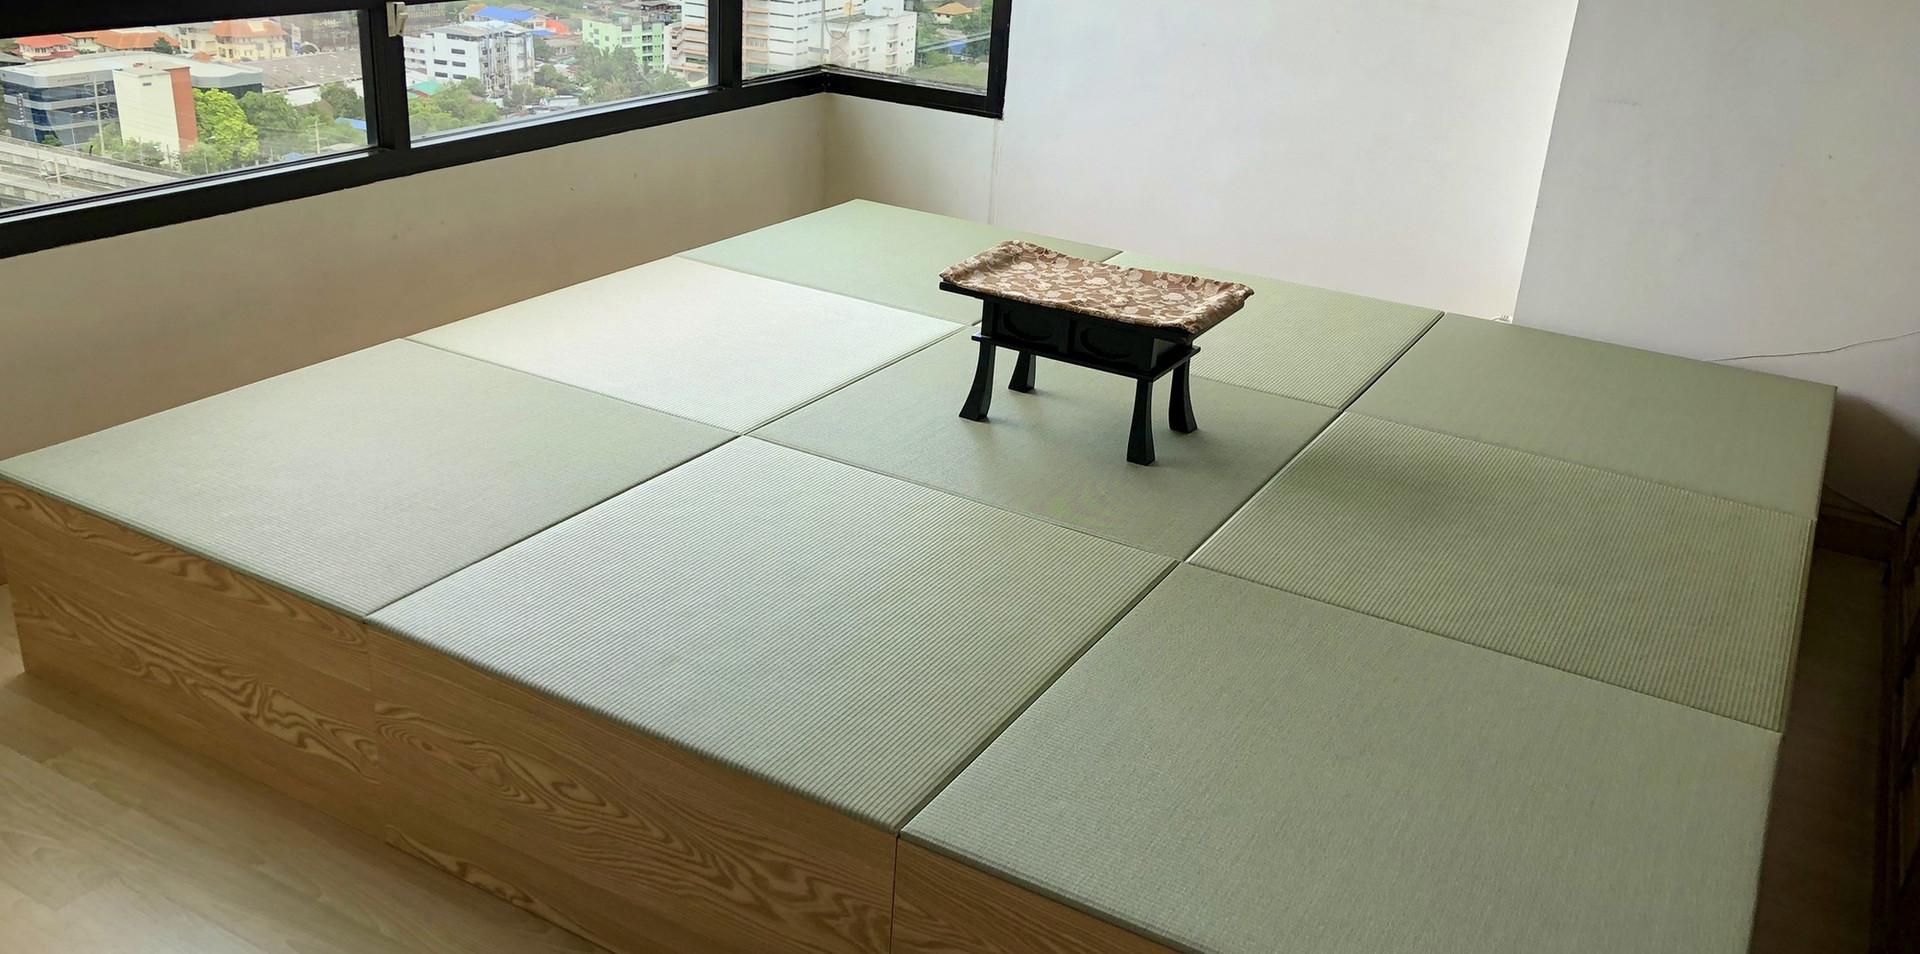 MESEKI GREEN x Tatami Living Corner 9 ชุด